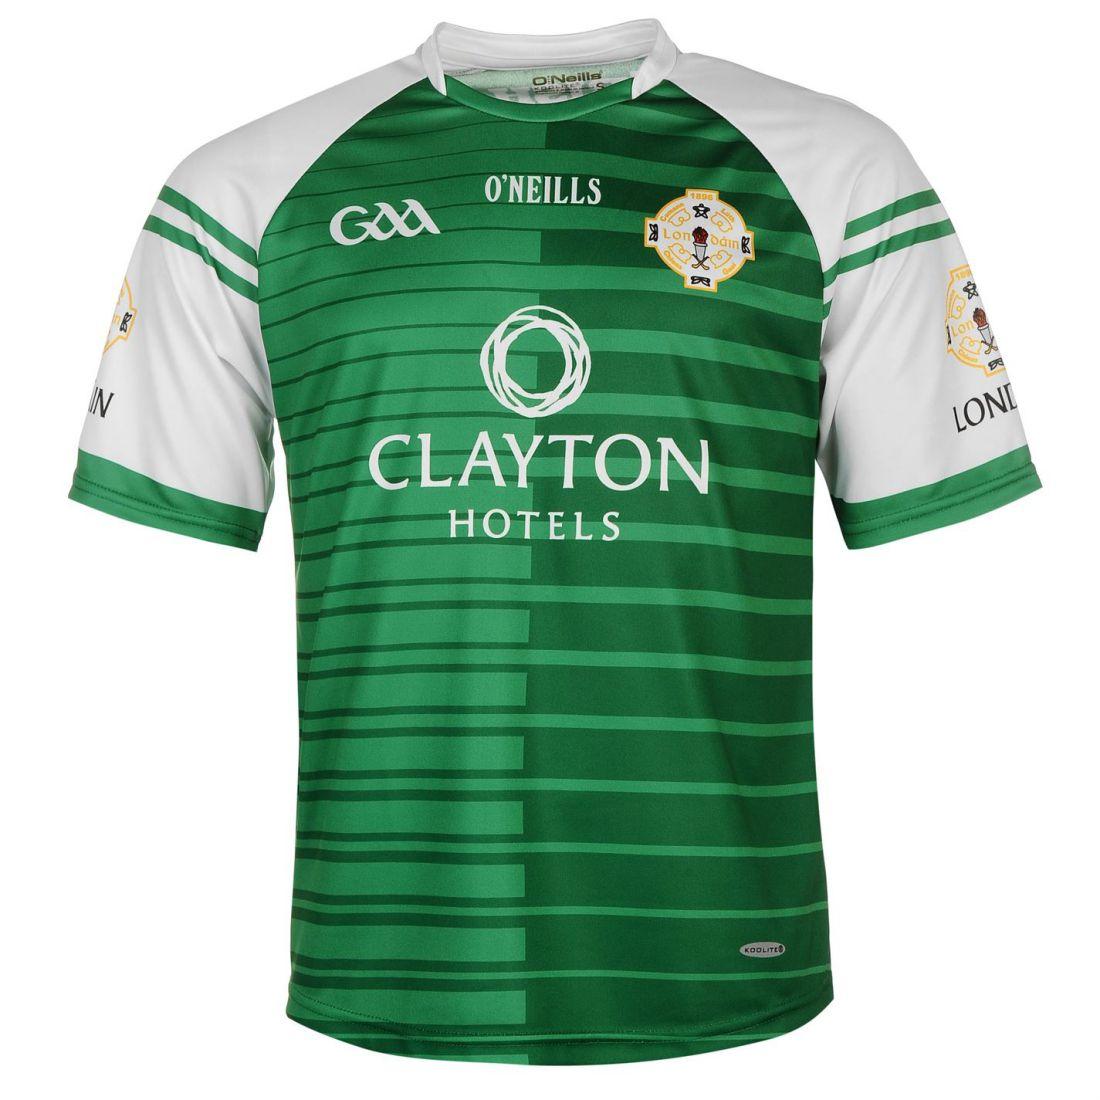 Oneills London GAA home jersey Mens Gents Shirt à Encolure Ras-du-cou à manches courtes regular